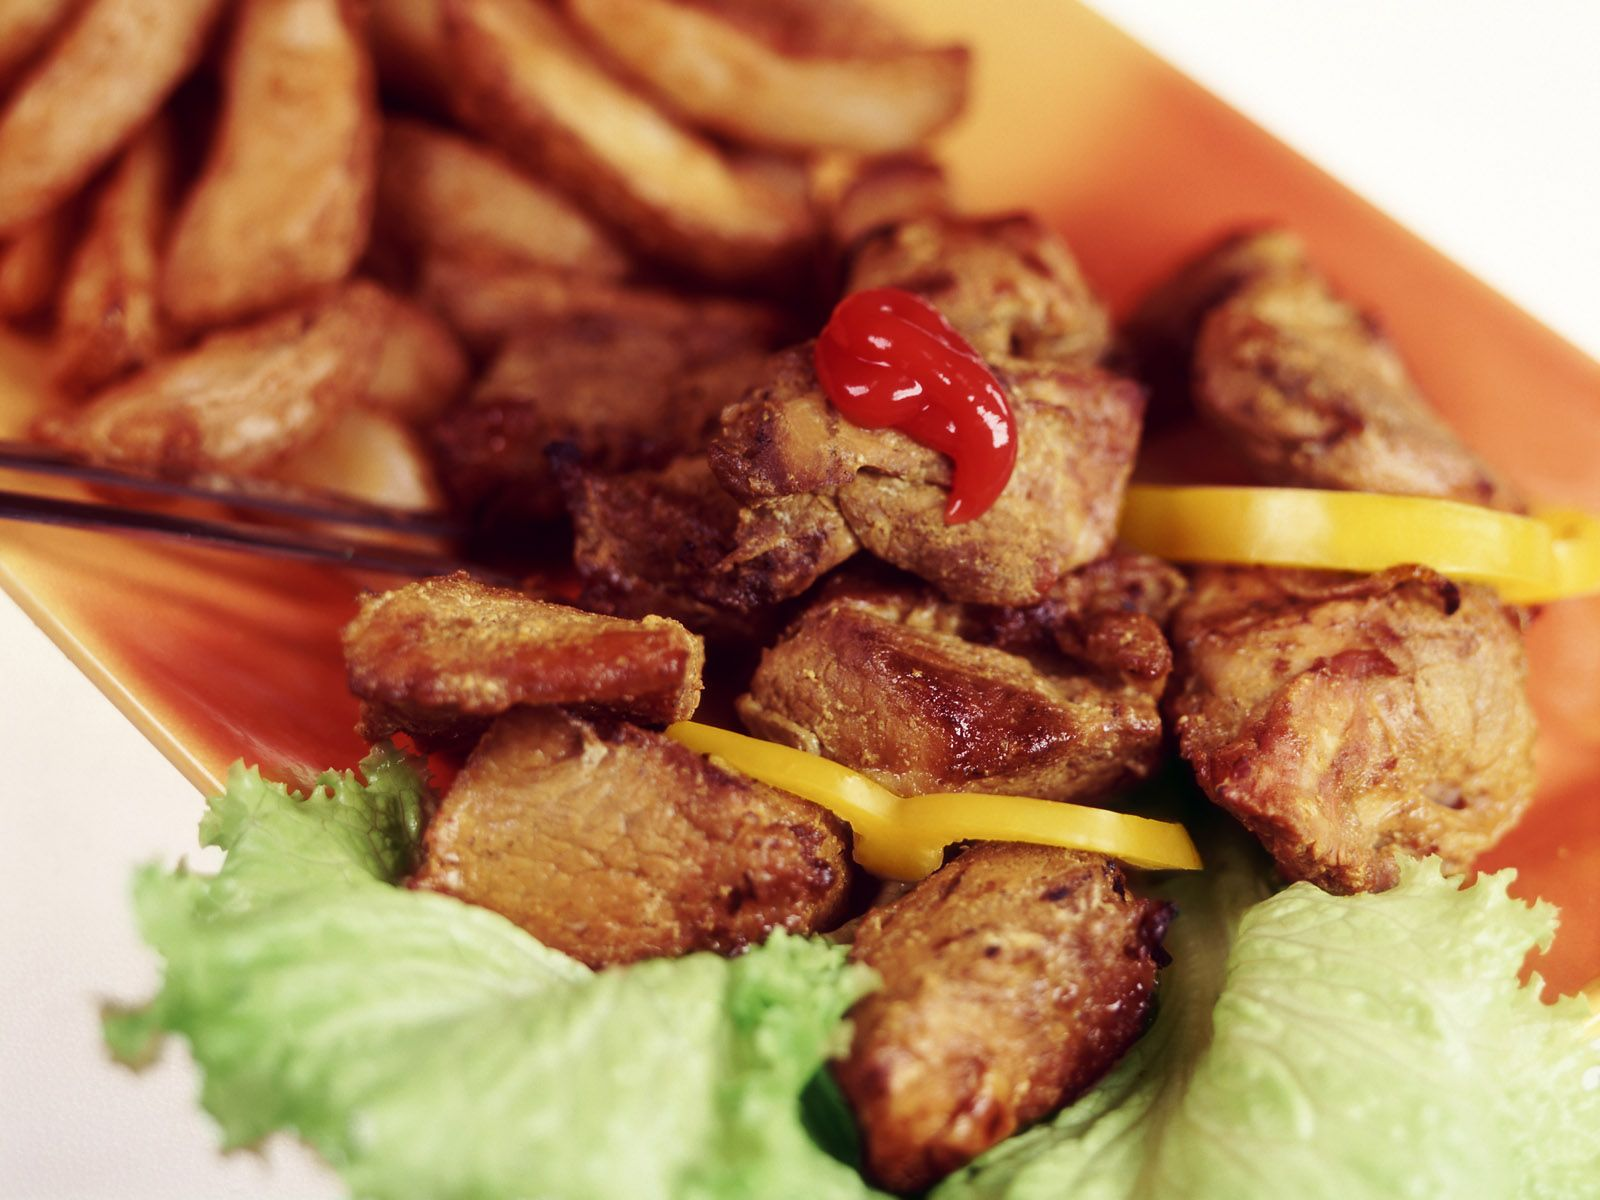 Crispy pieces of meat